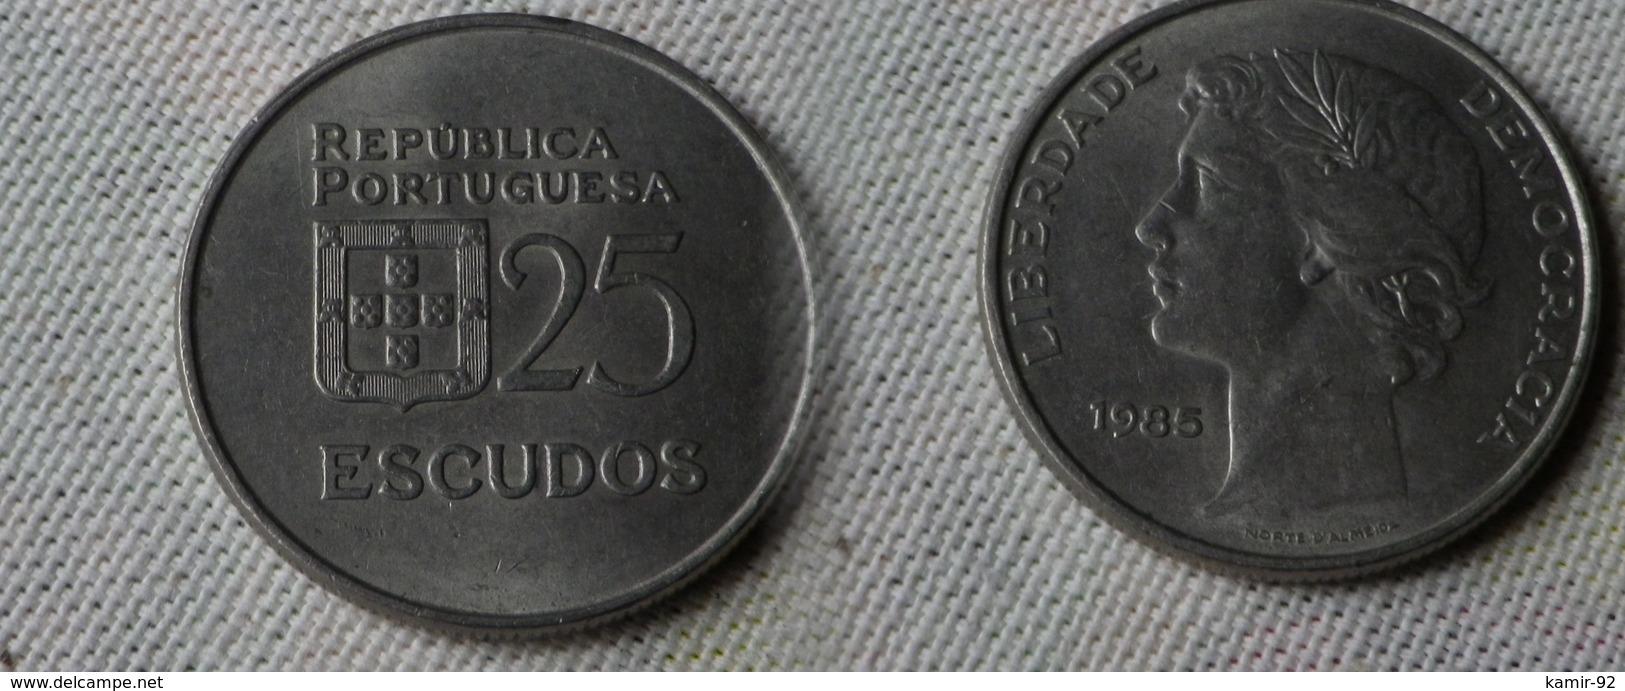 Portugal 25   Escudos 1985   Km#607 A  -  Ttb - Portugal